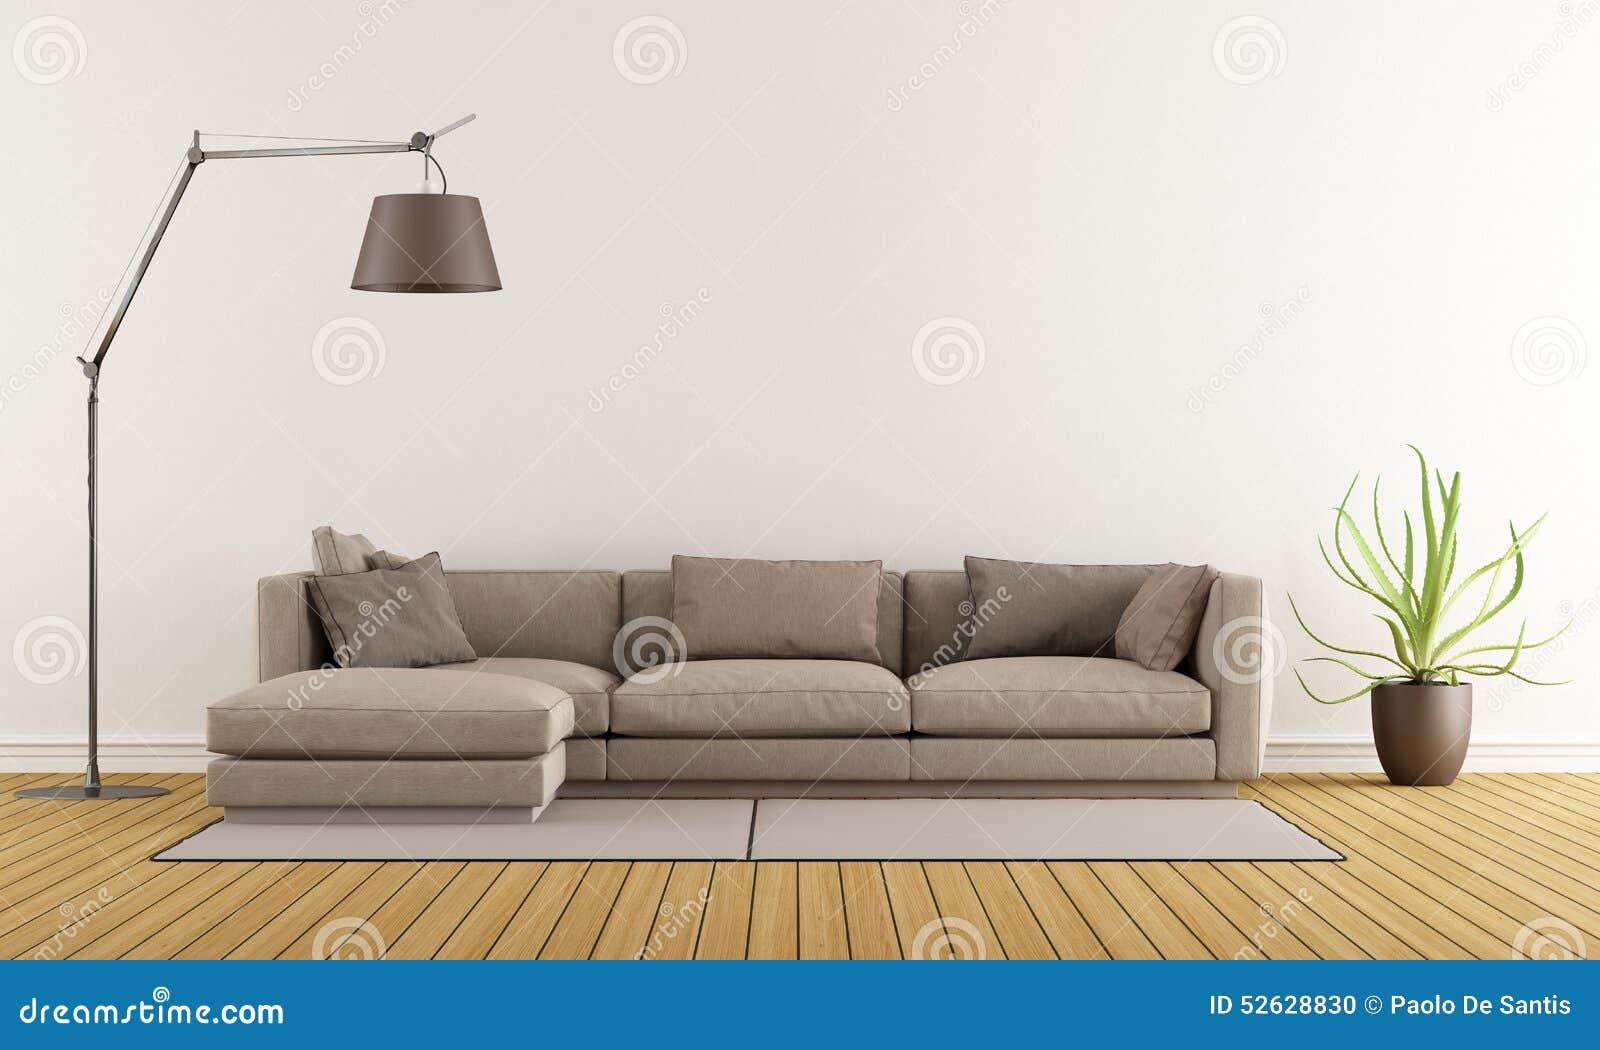 Moderne Zitkamer Stock Illustratie - Afbeelding: 52628830